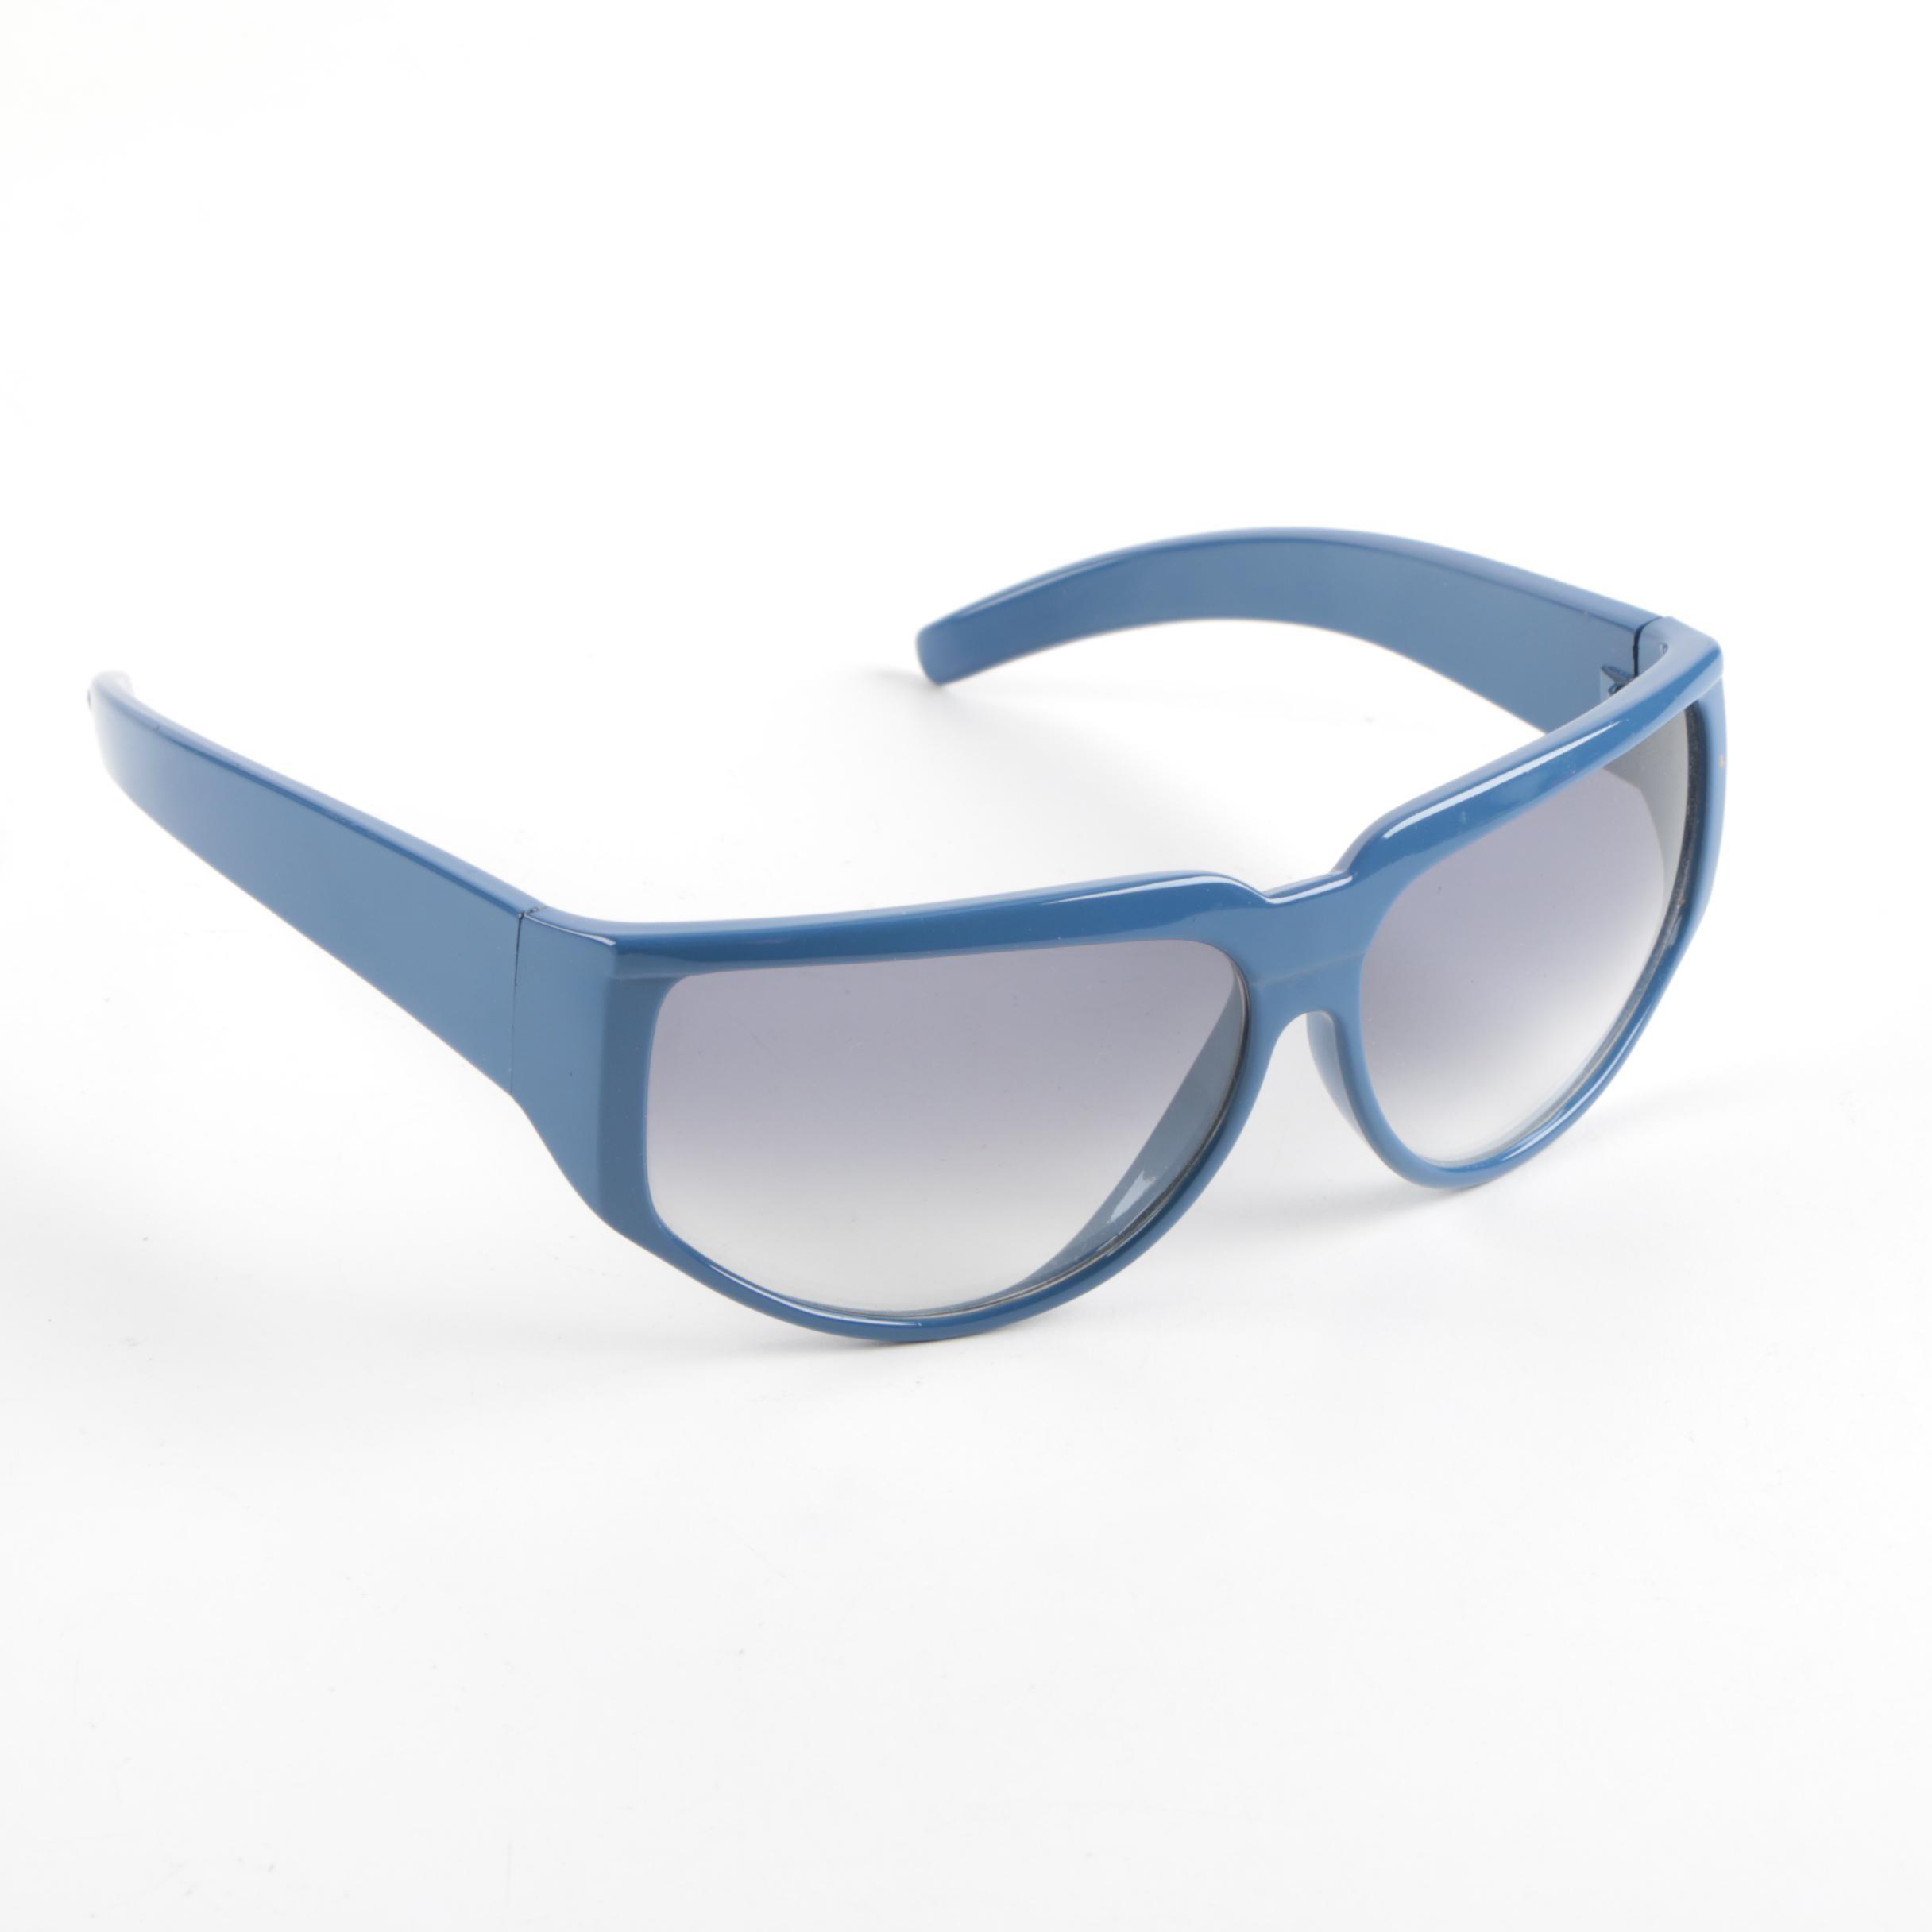 Vintage Charles Jourdan Sunglasses